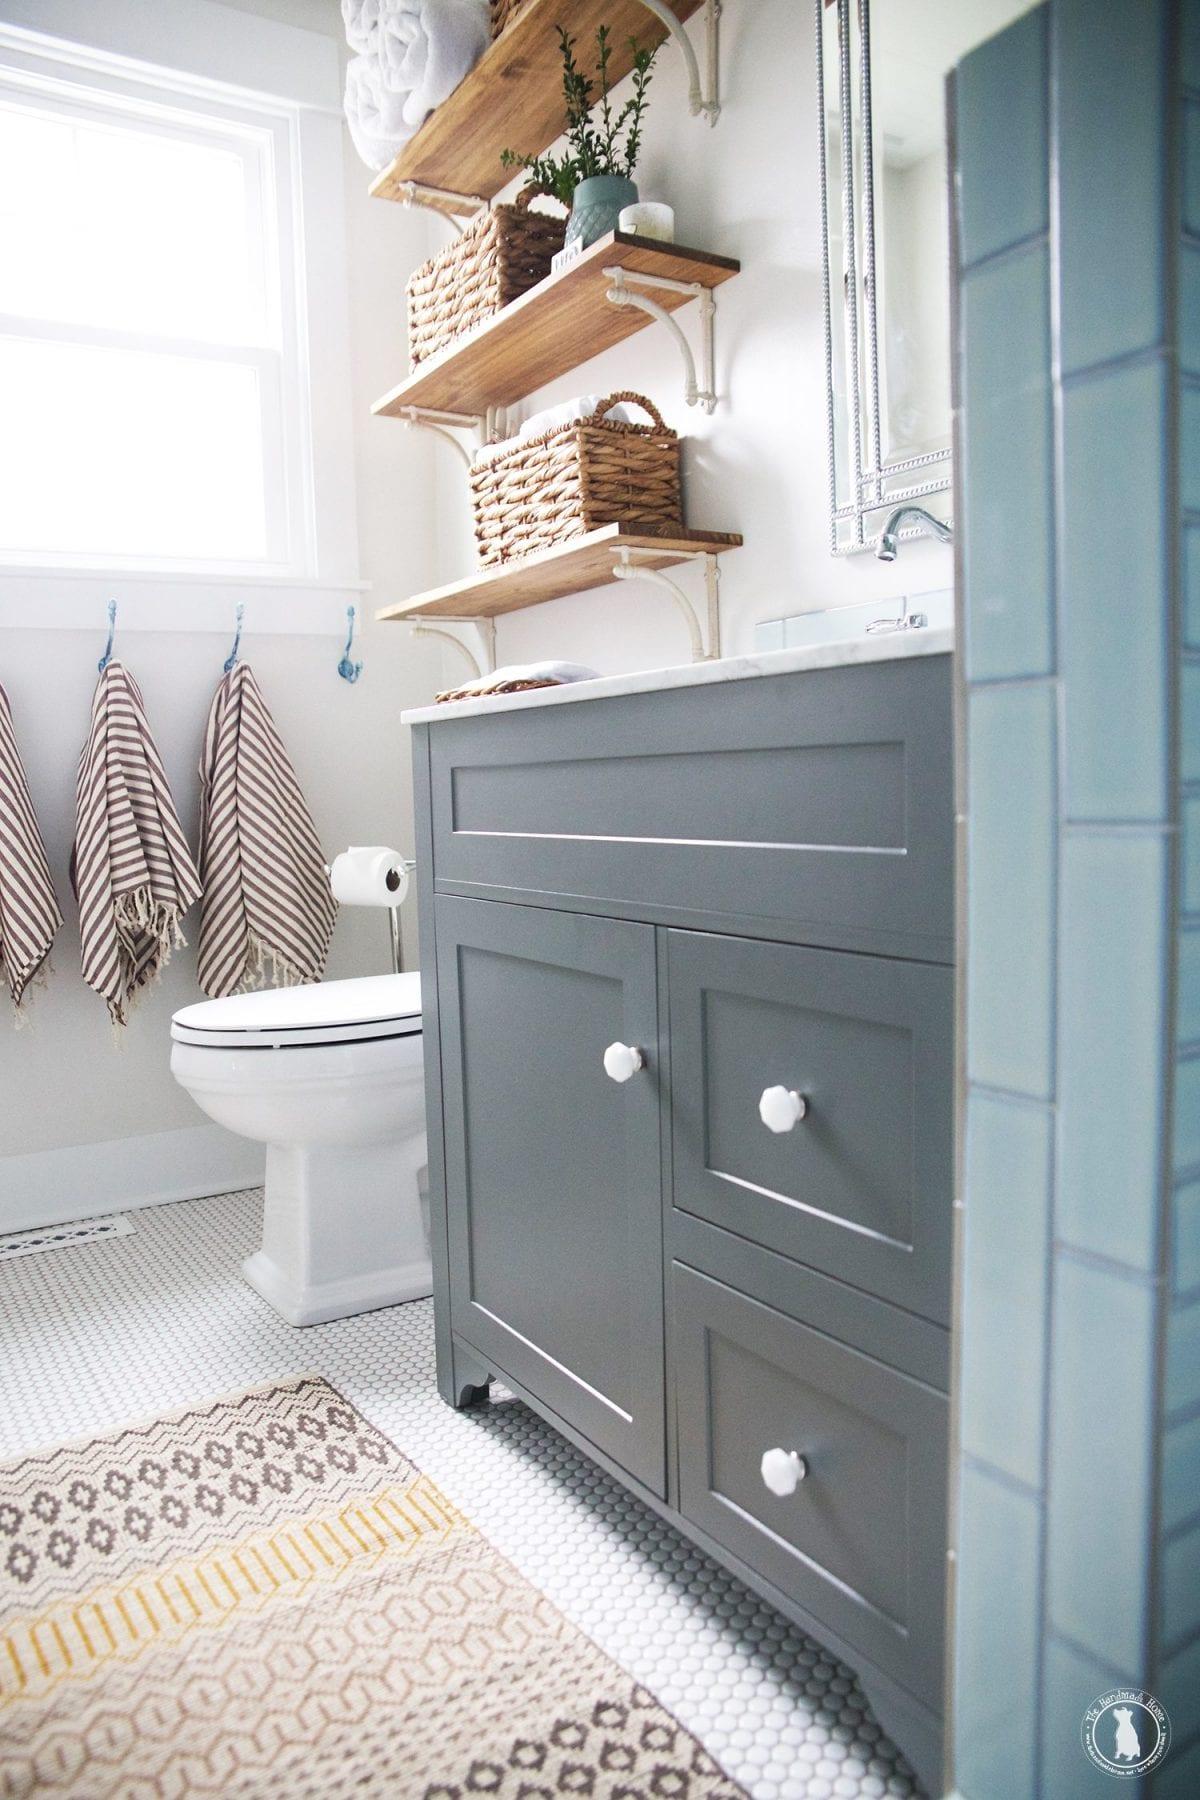 Bathroom Signs Home Depot master bathroom renovation - the handmade home